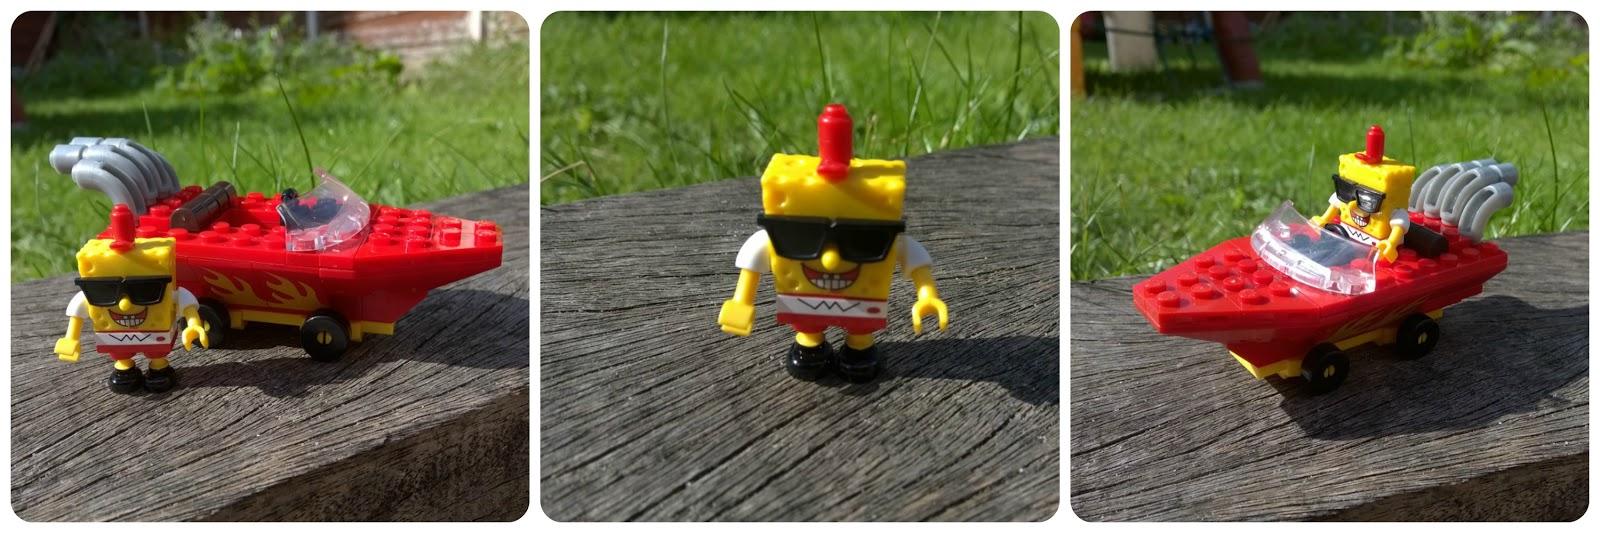 SpongeBob Squarepants Mega Bloks SpongeBob Racer